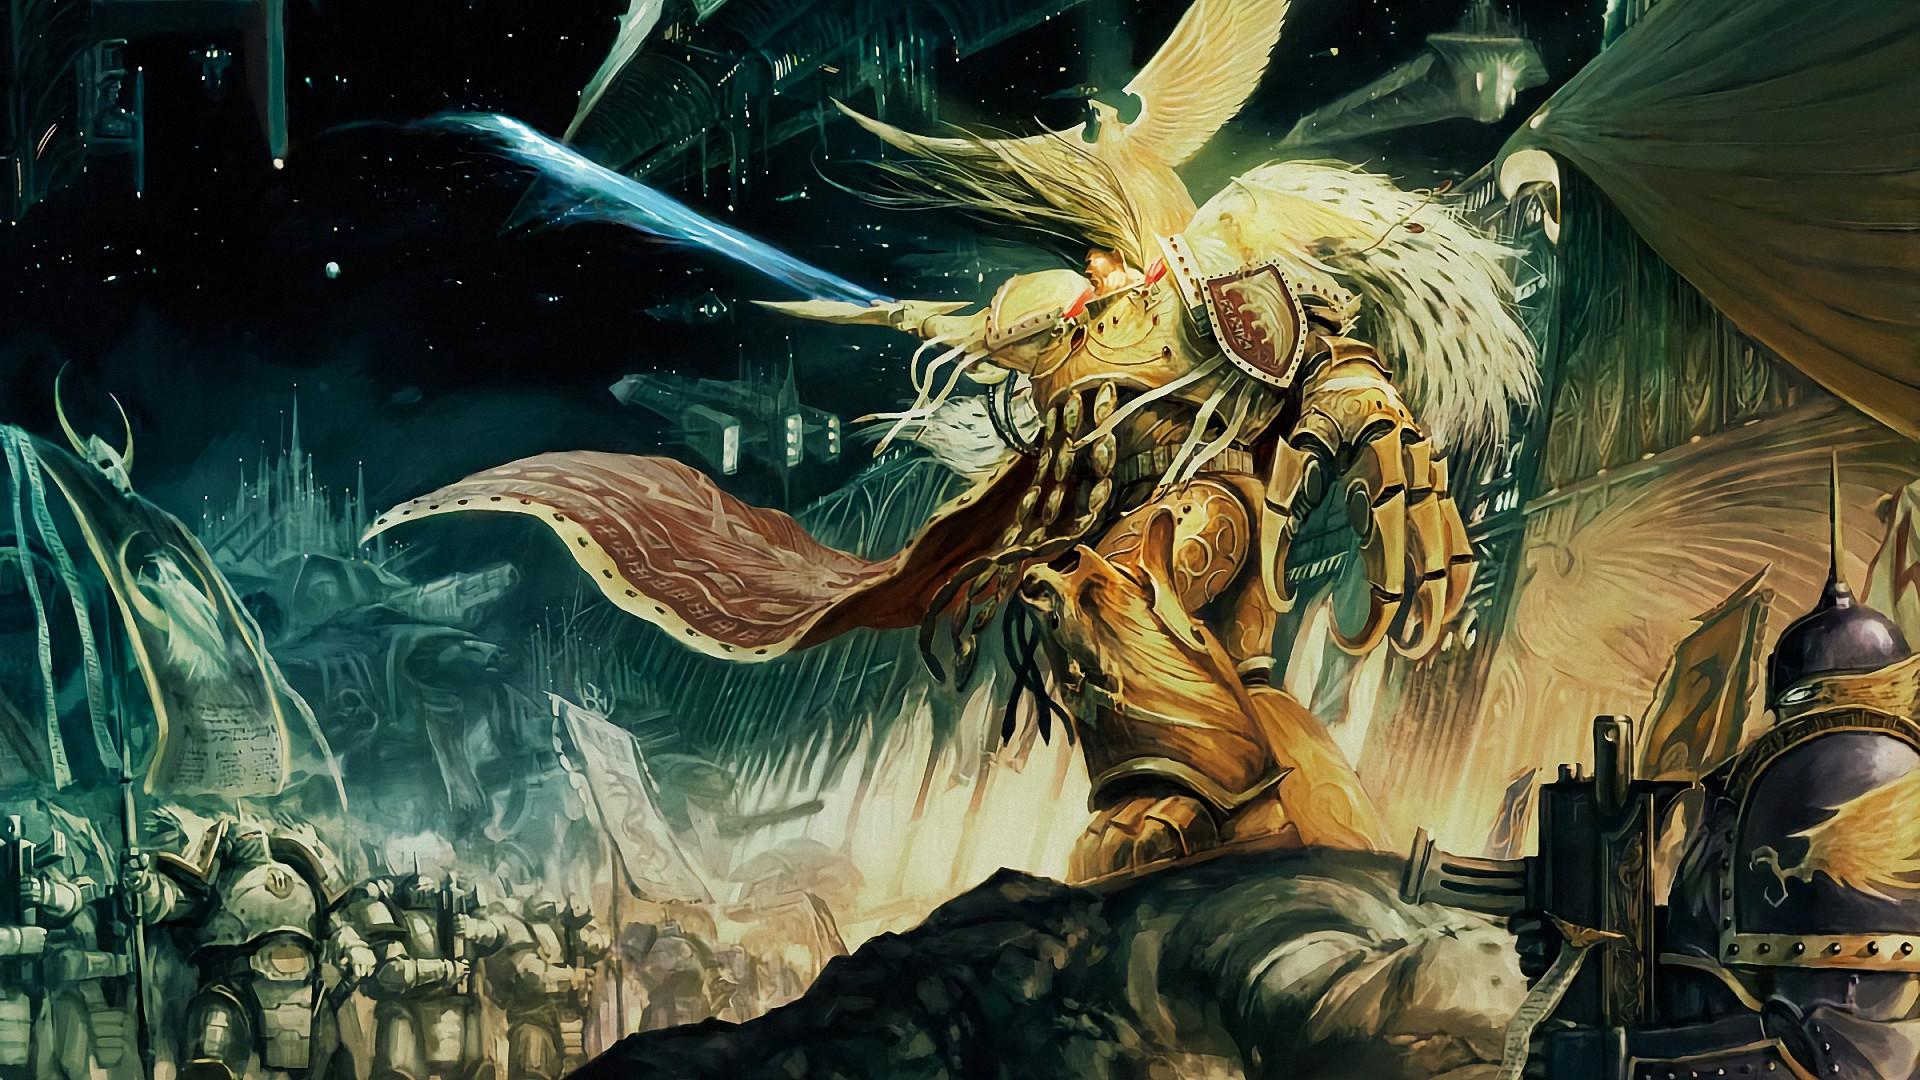 L'horloge parlante! - Page 43 59448_warhammer_40k_emperor_of_mankind